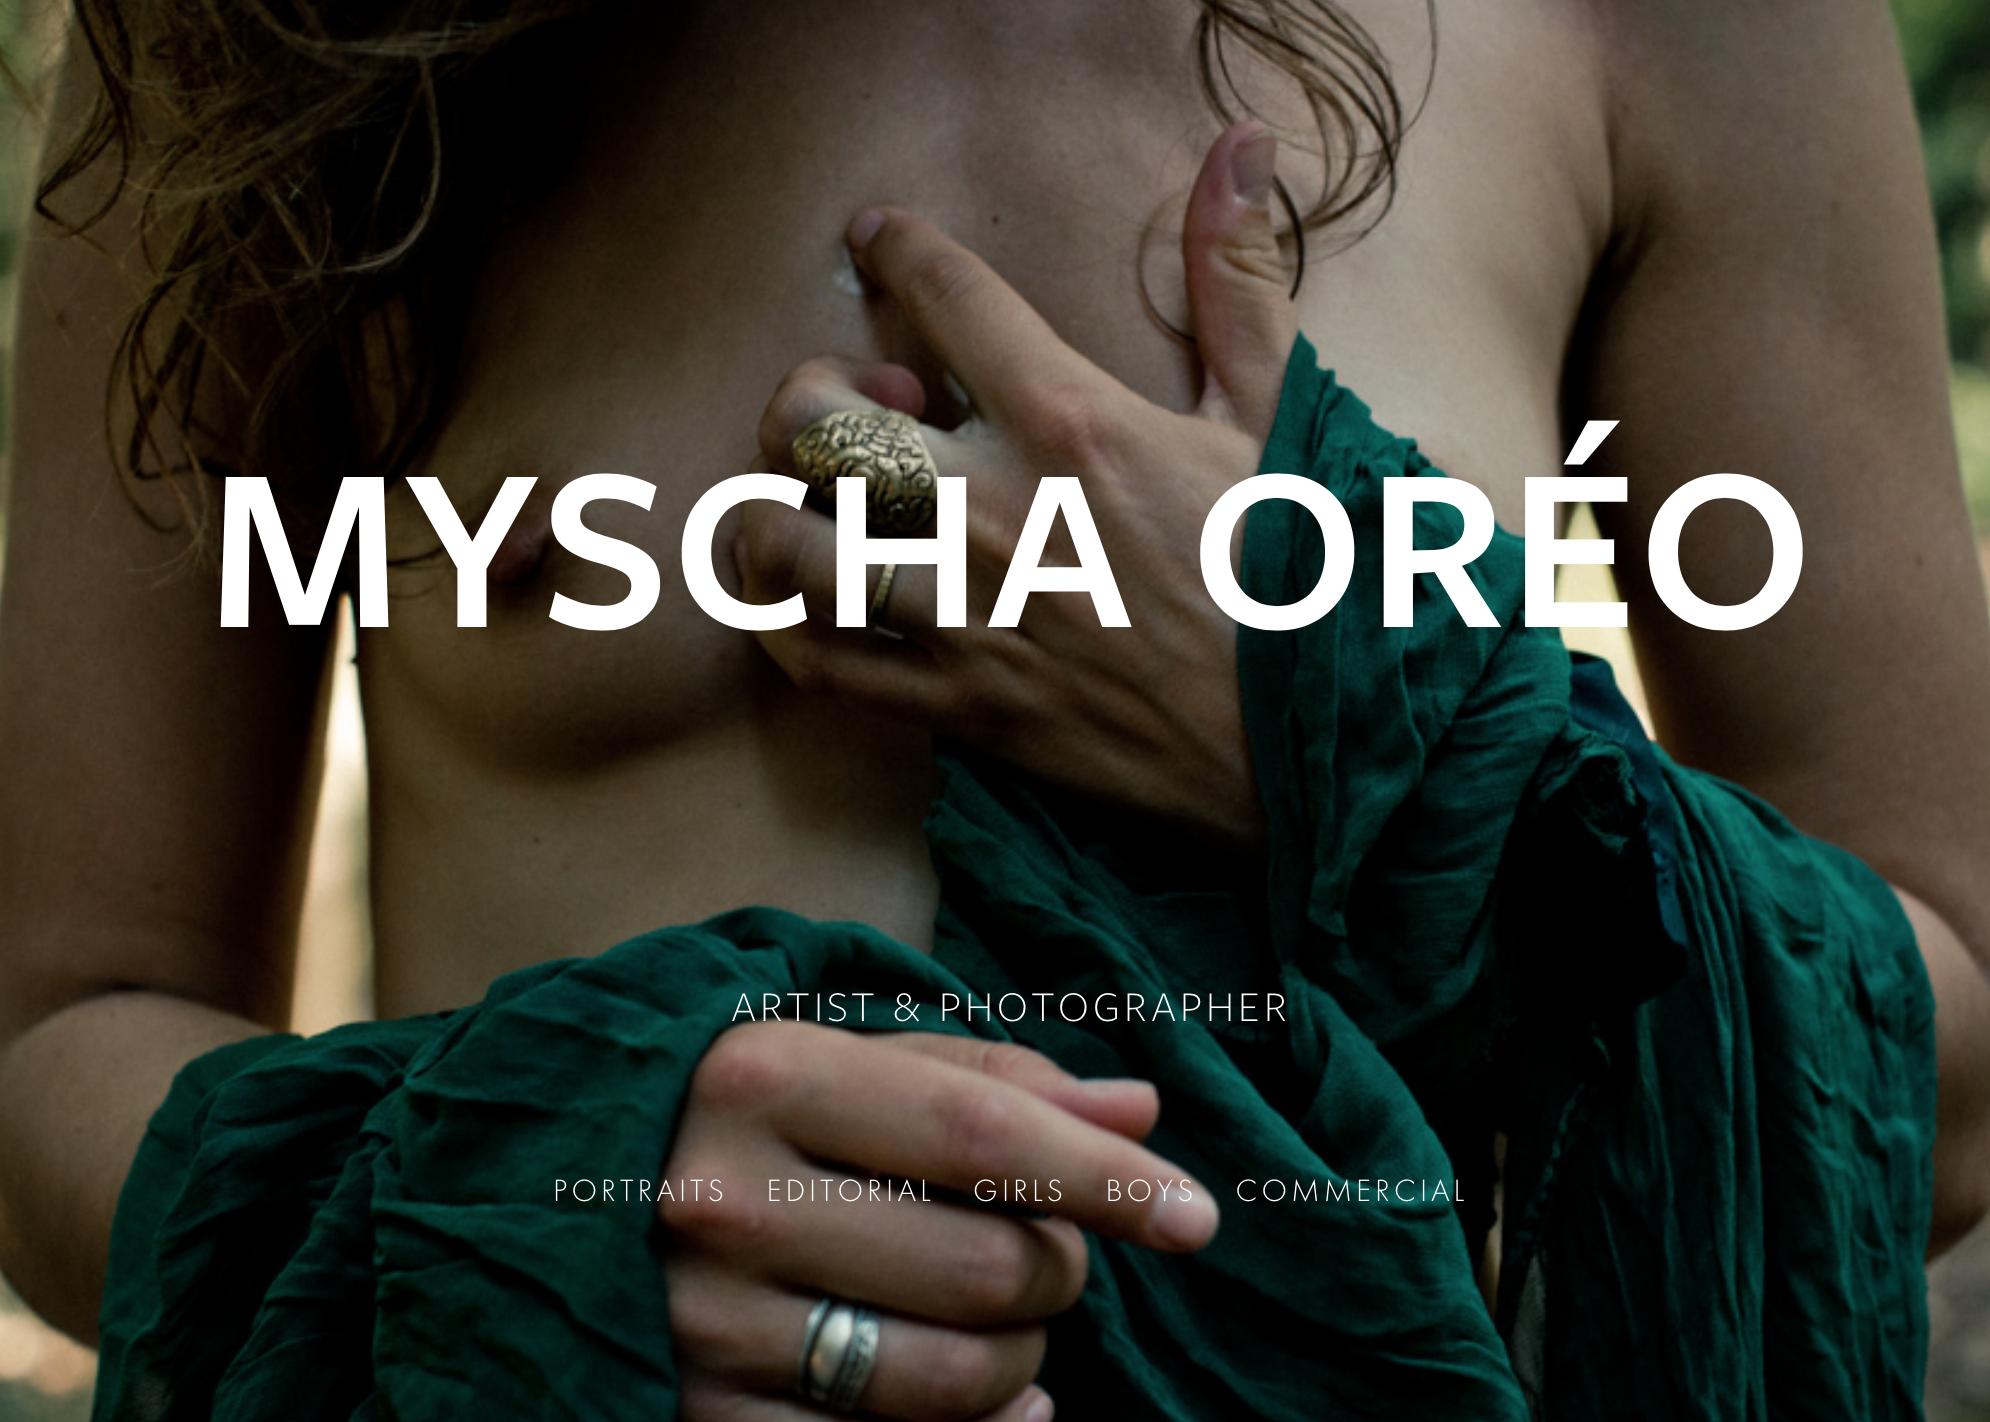 Myscha Oréo, artist & photographer